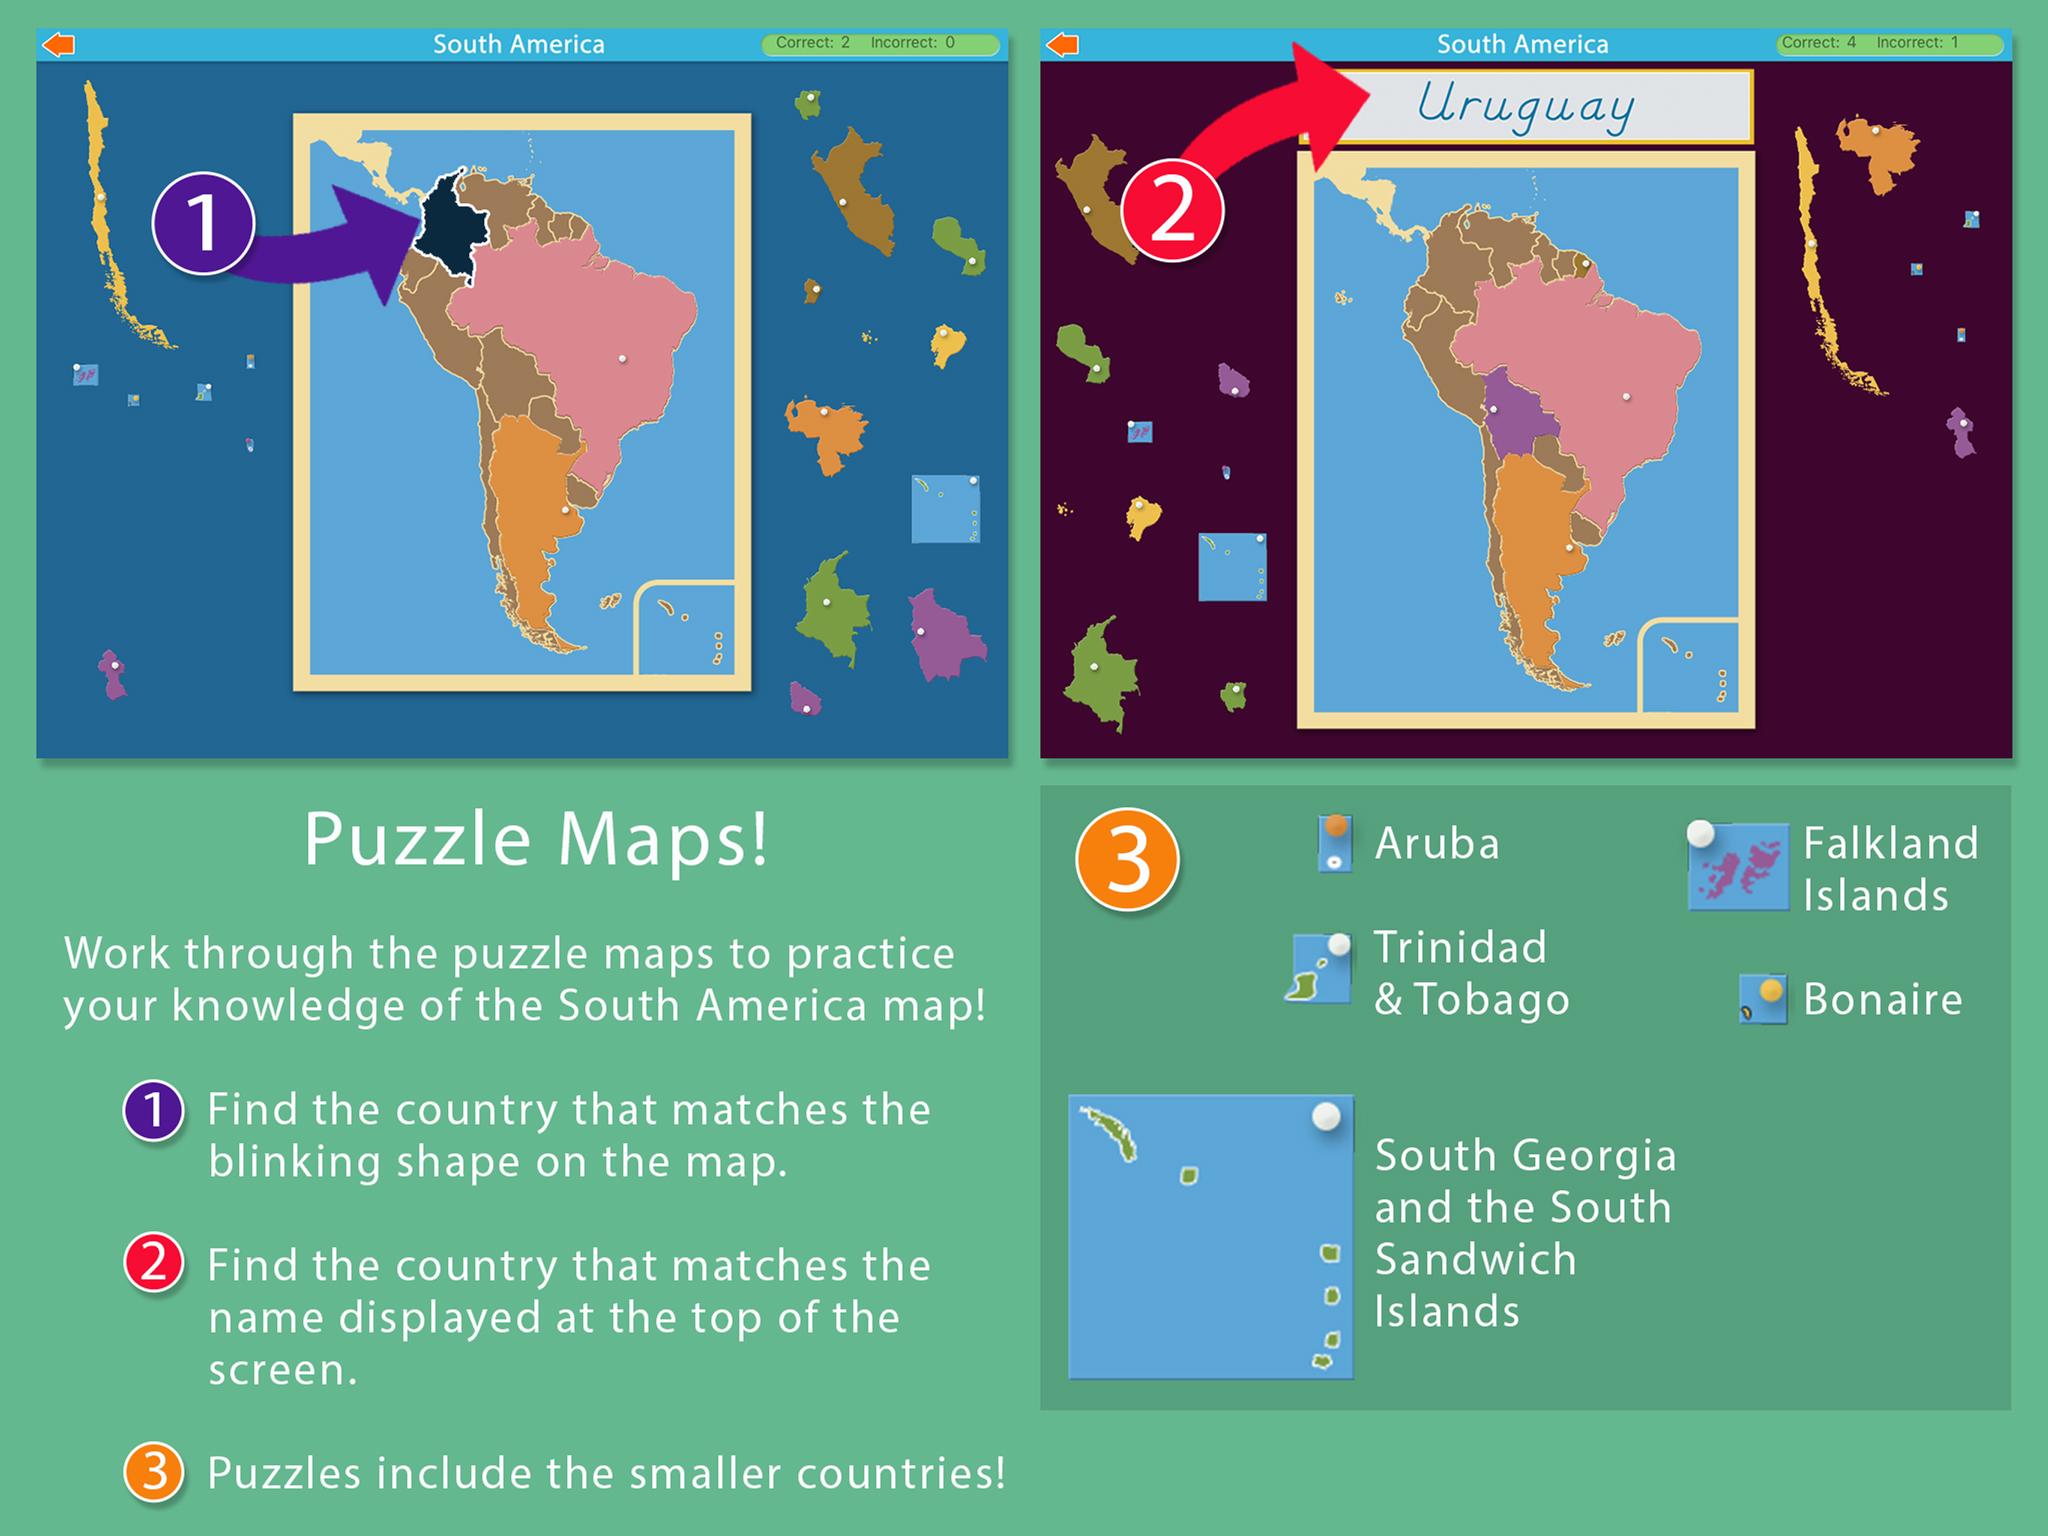 SouthAmericaGeographySouthAmericaGeographySouthAmericaGeography-reg.jpg